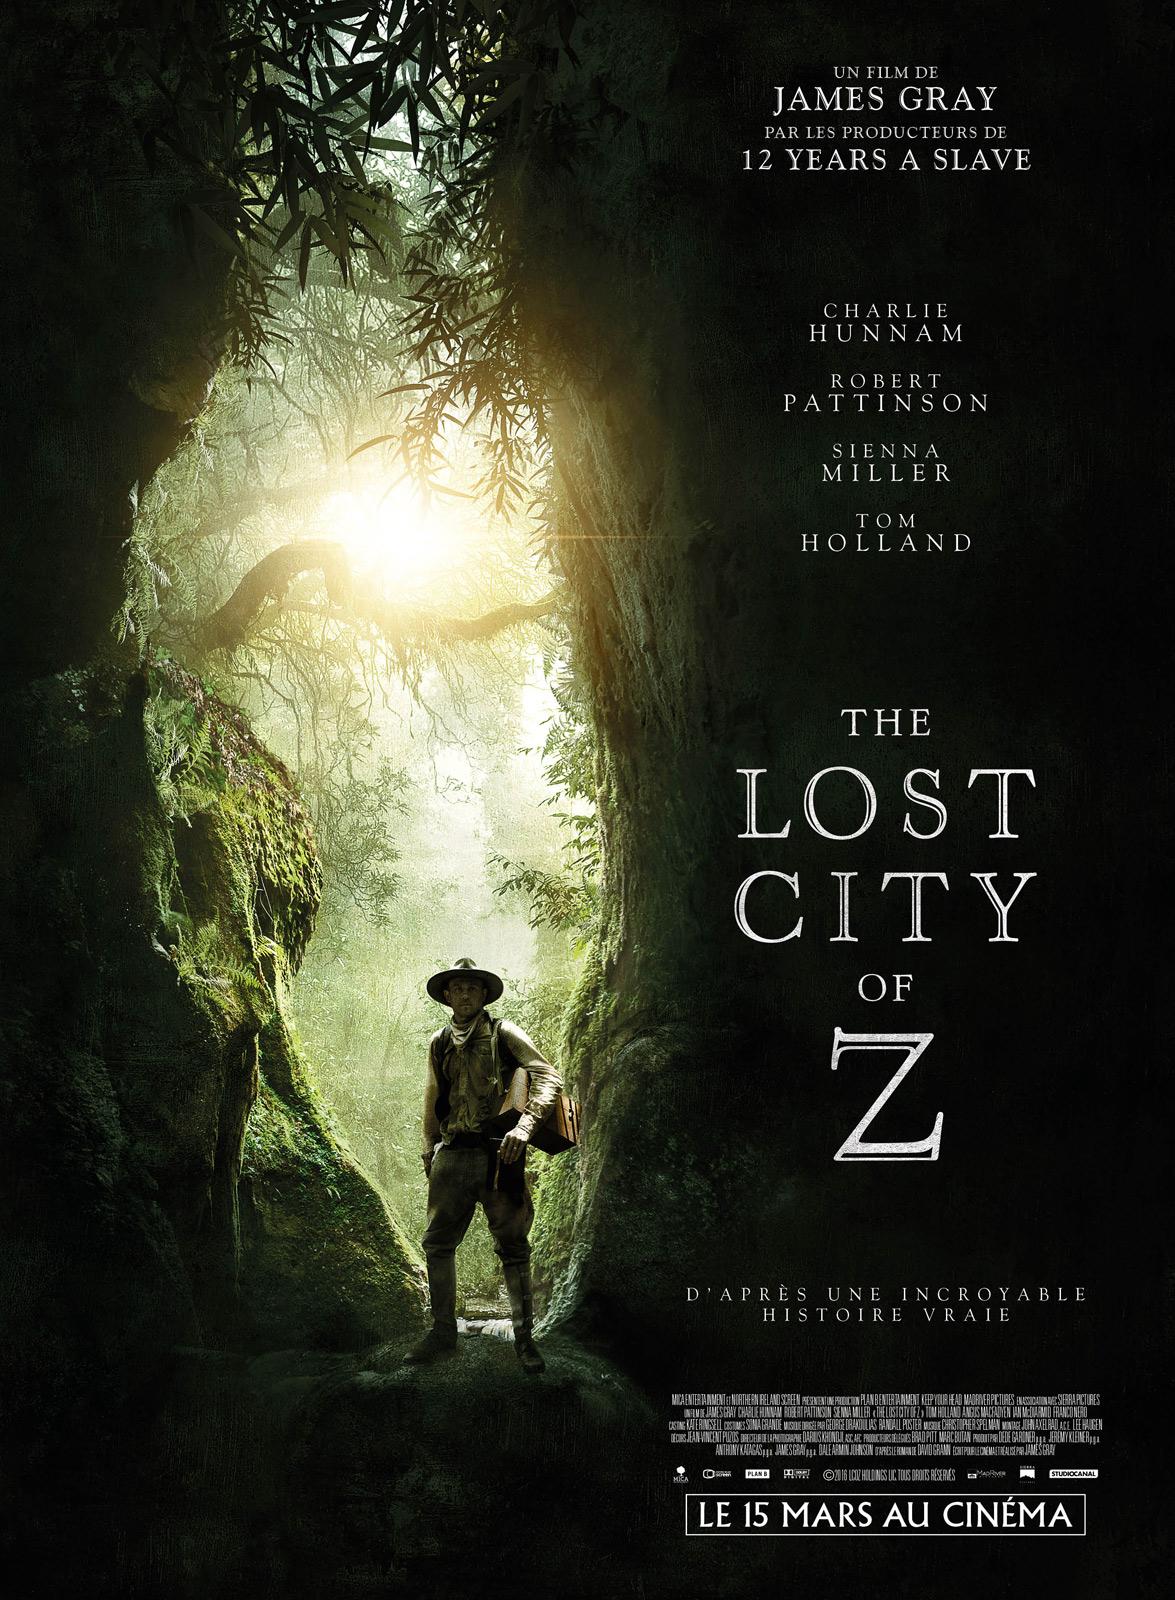 The Lost city of Z de James Gray